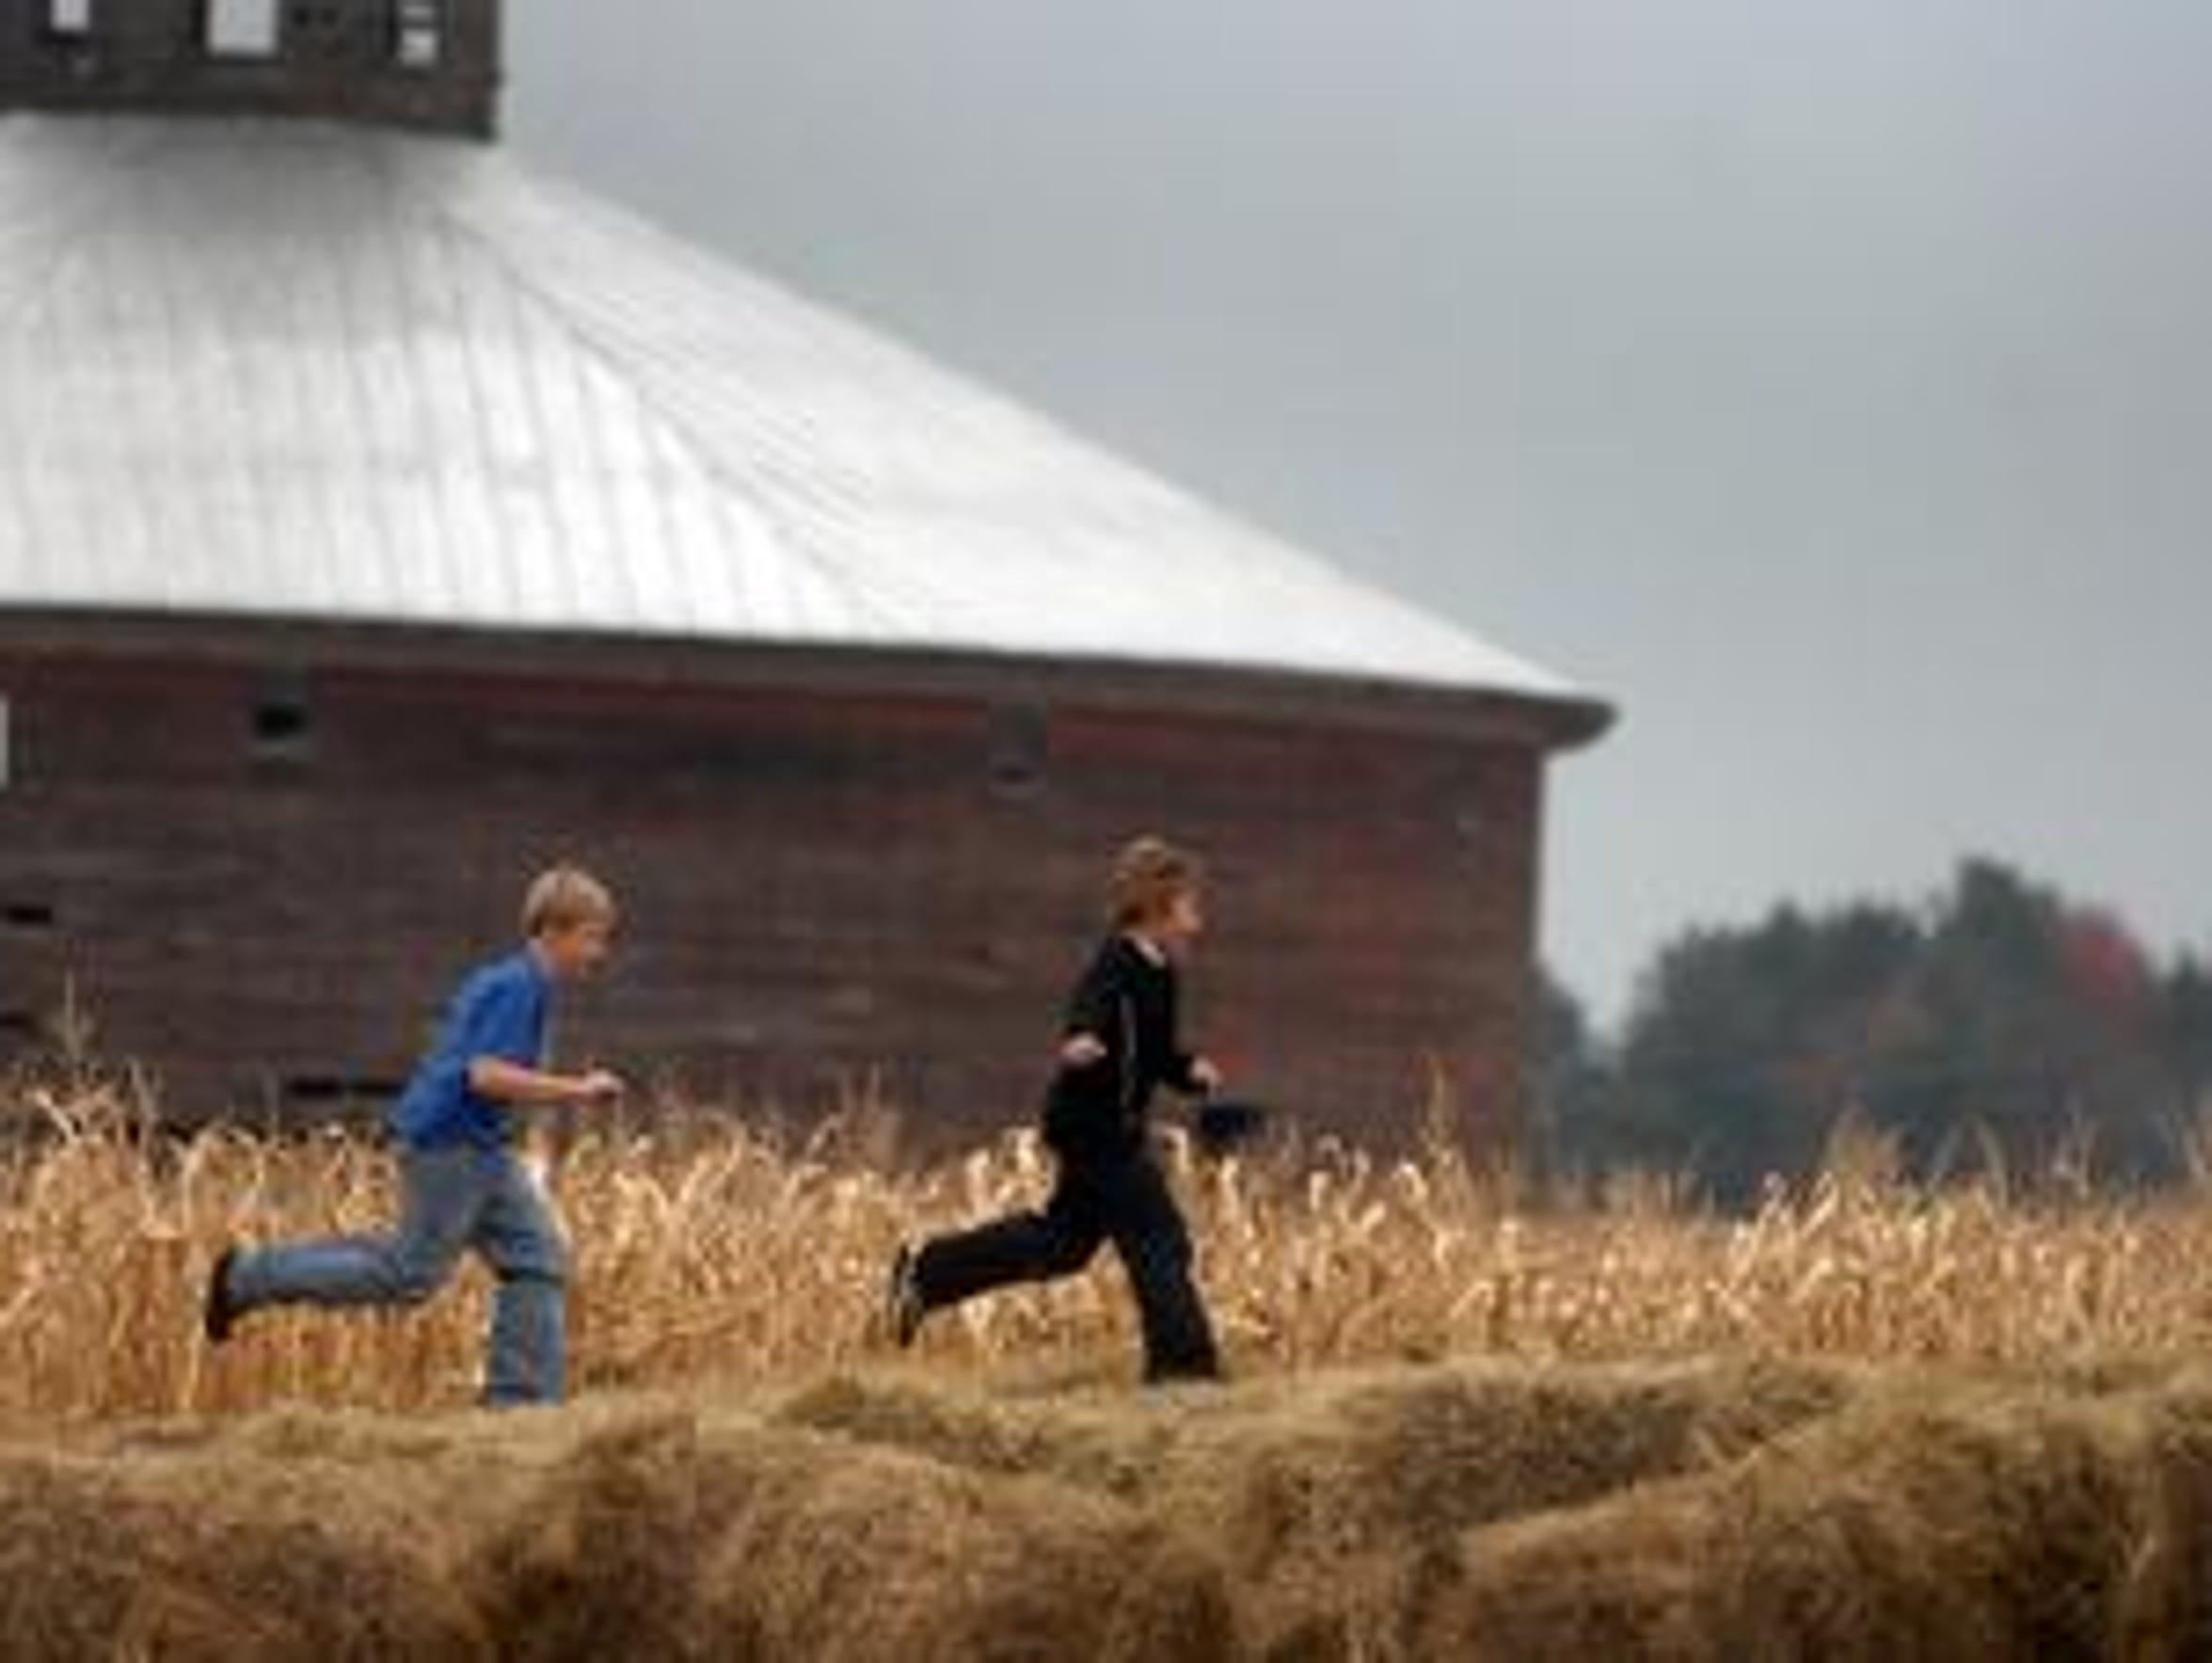 Michael Verick, 12, left, and August Geisen, 9, both